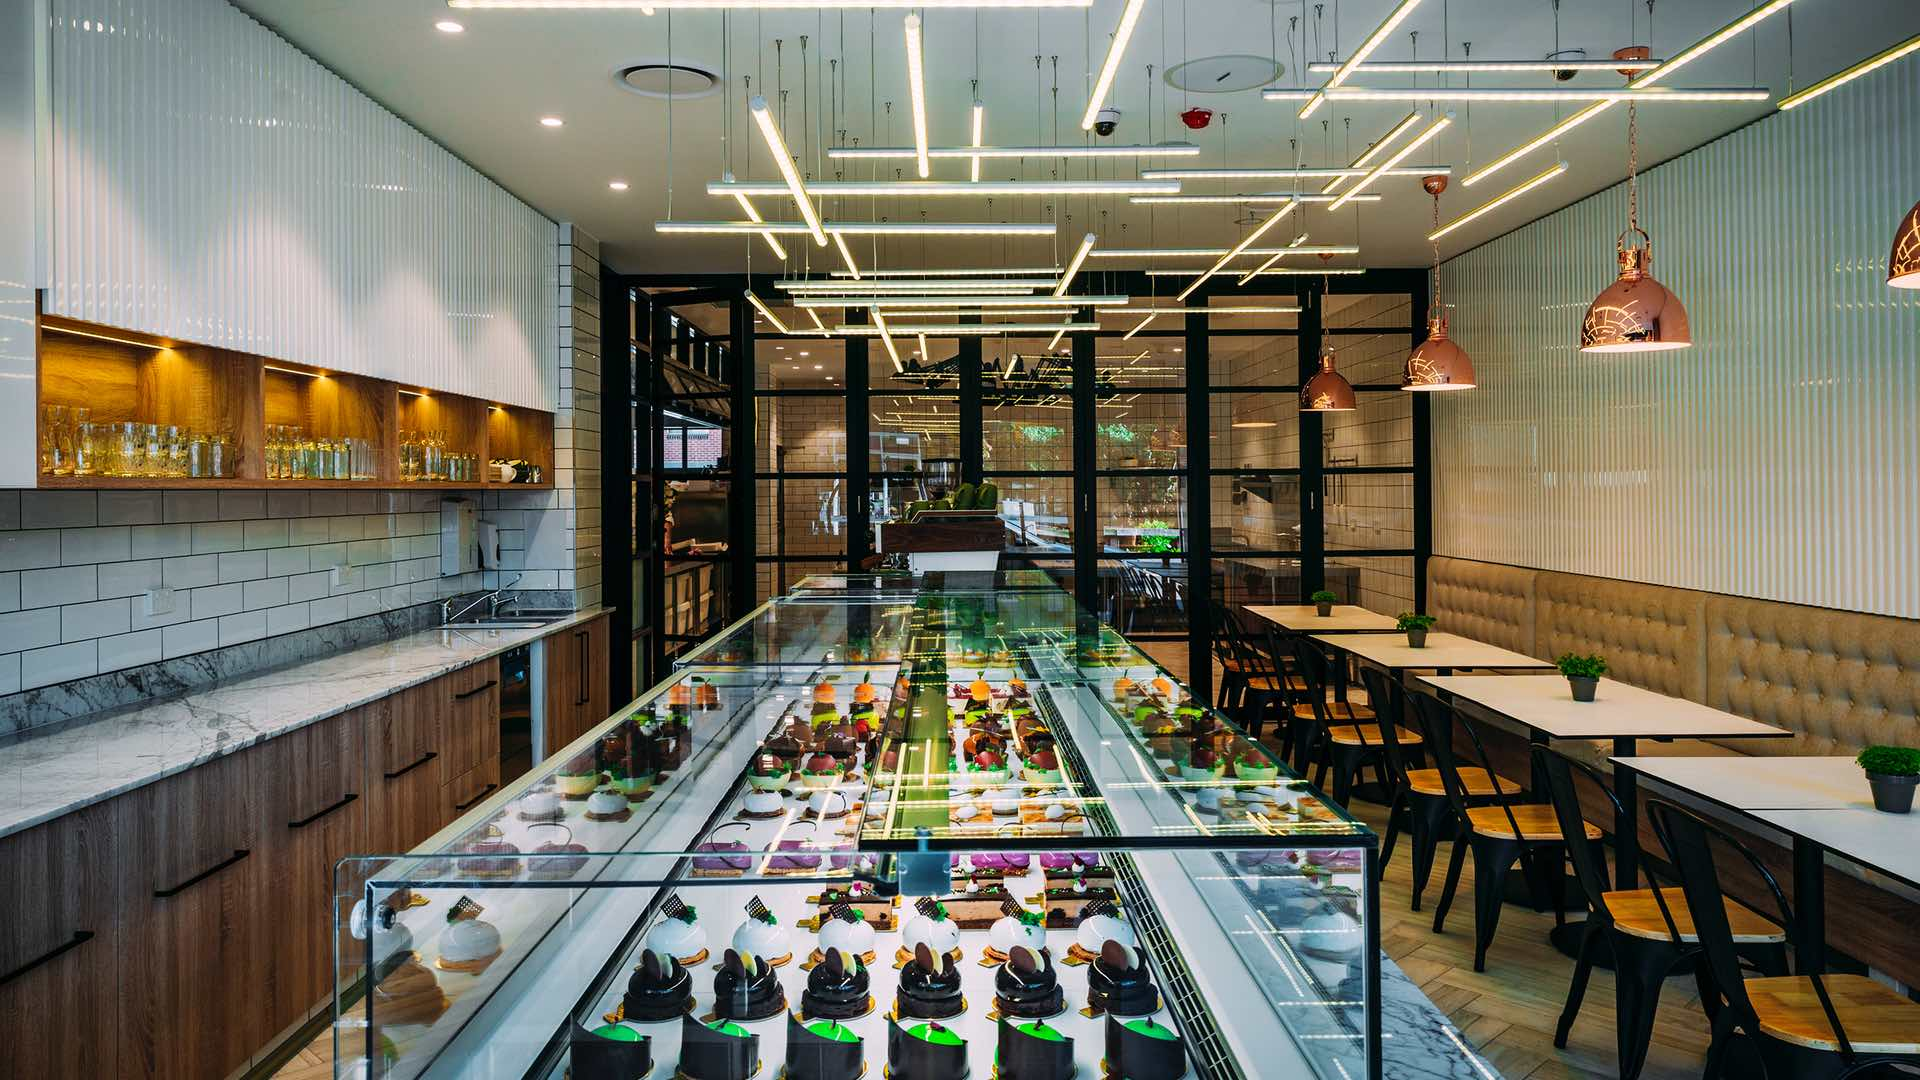 KOI Dessert Bar Ryde